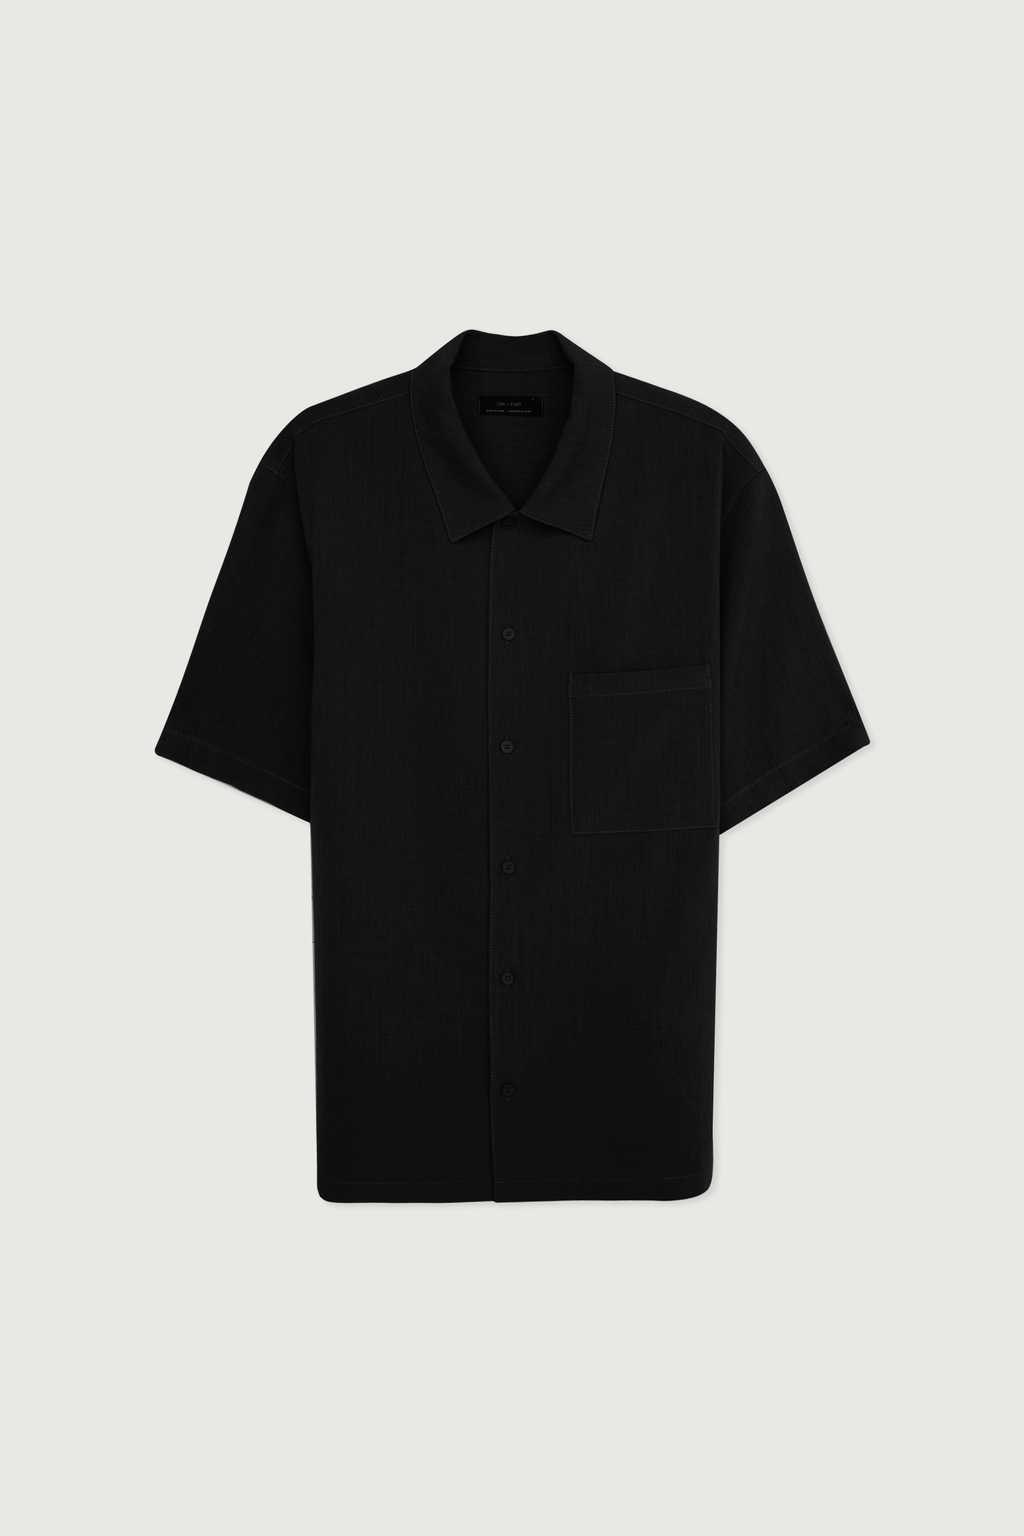 Shirt 3139 Black 12